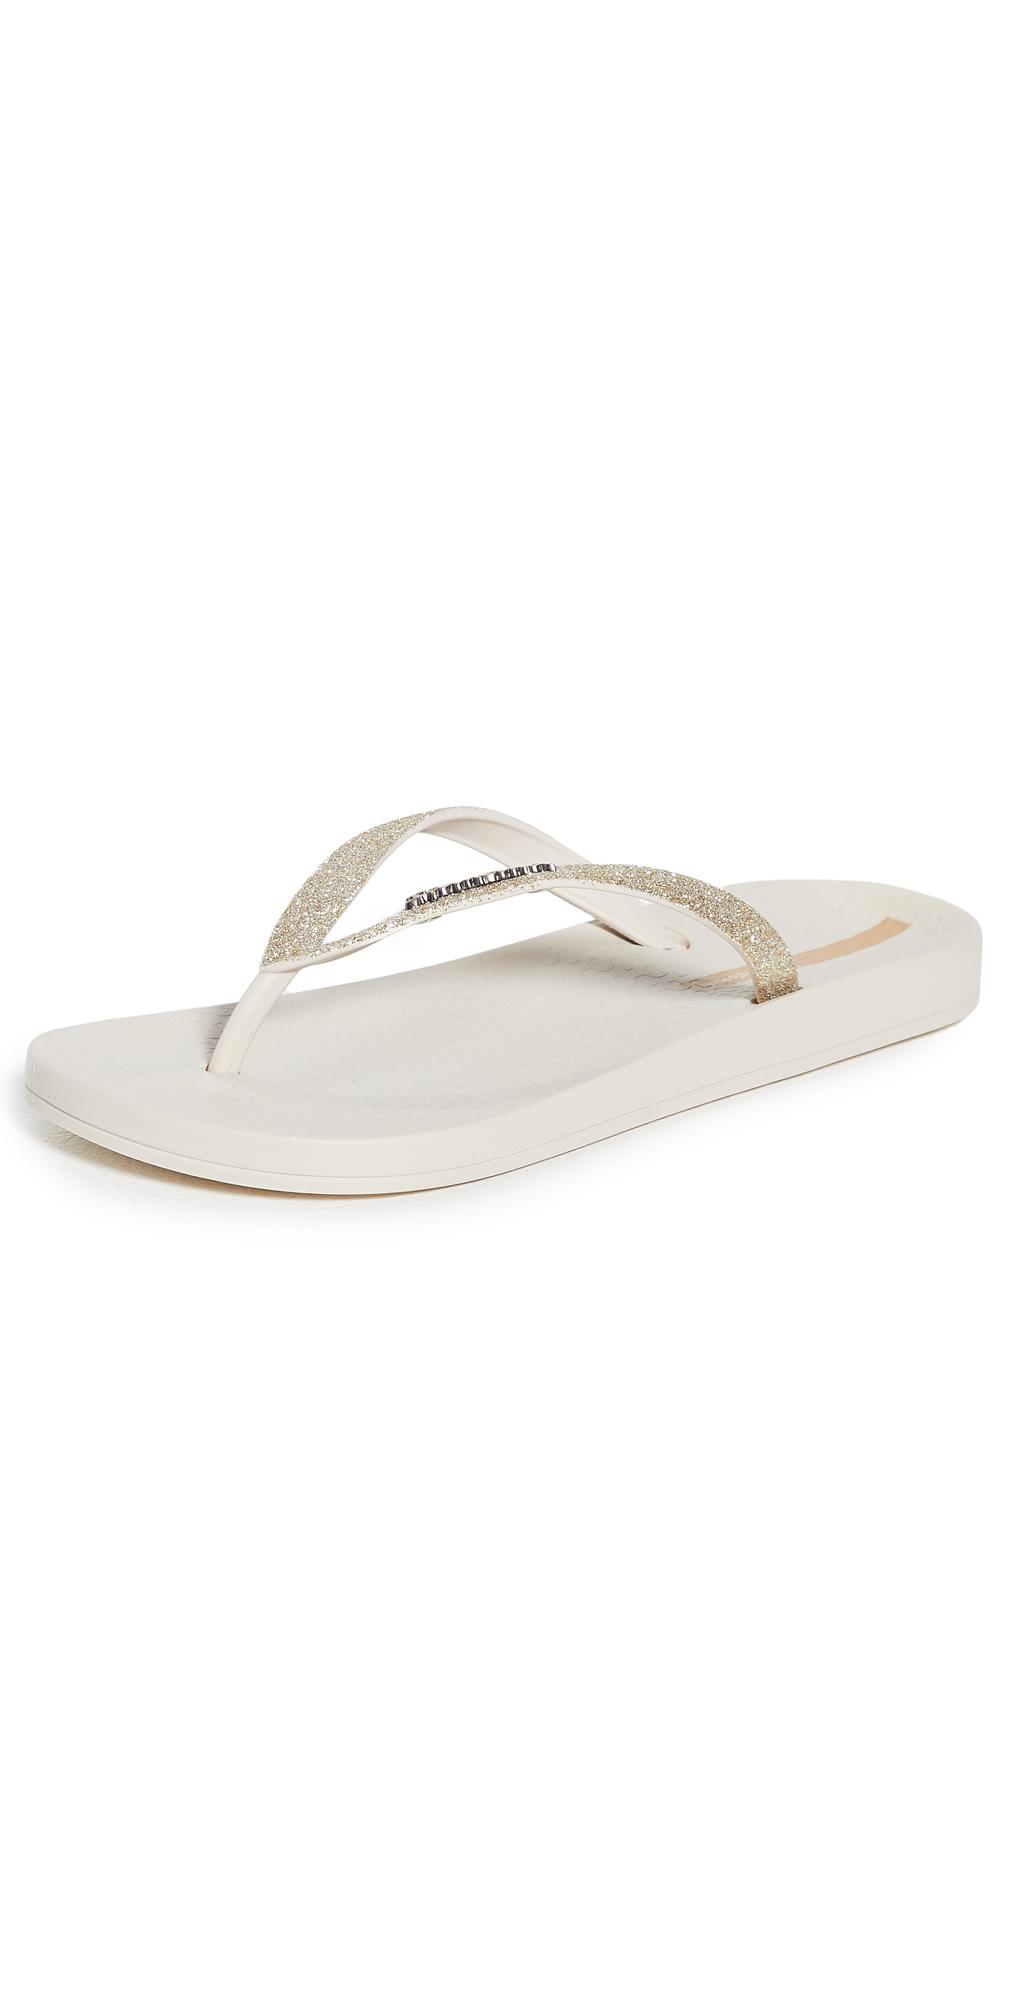 Ana Sparkle Flip Flops